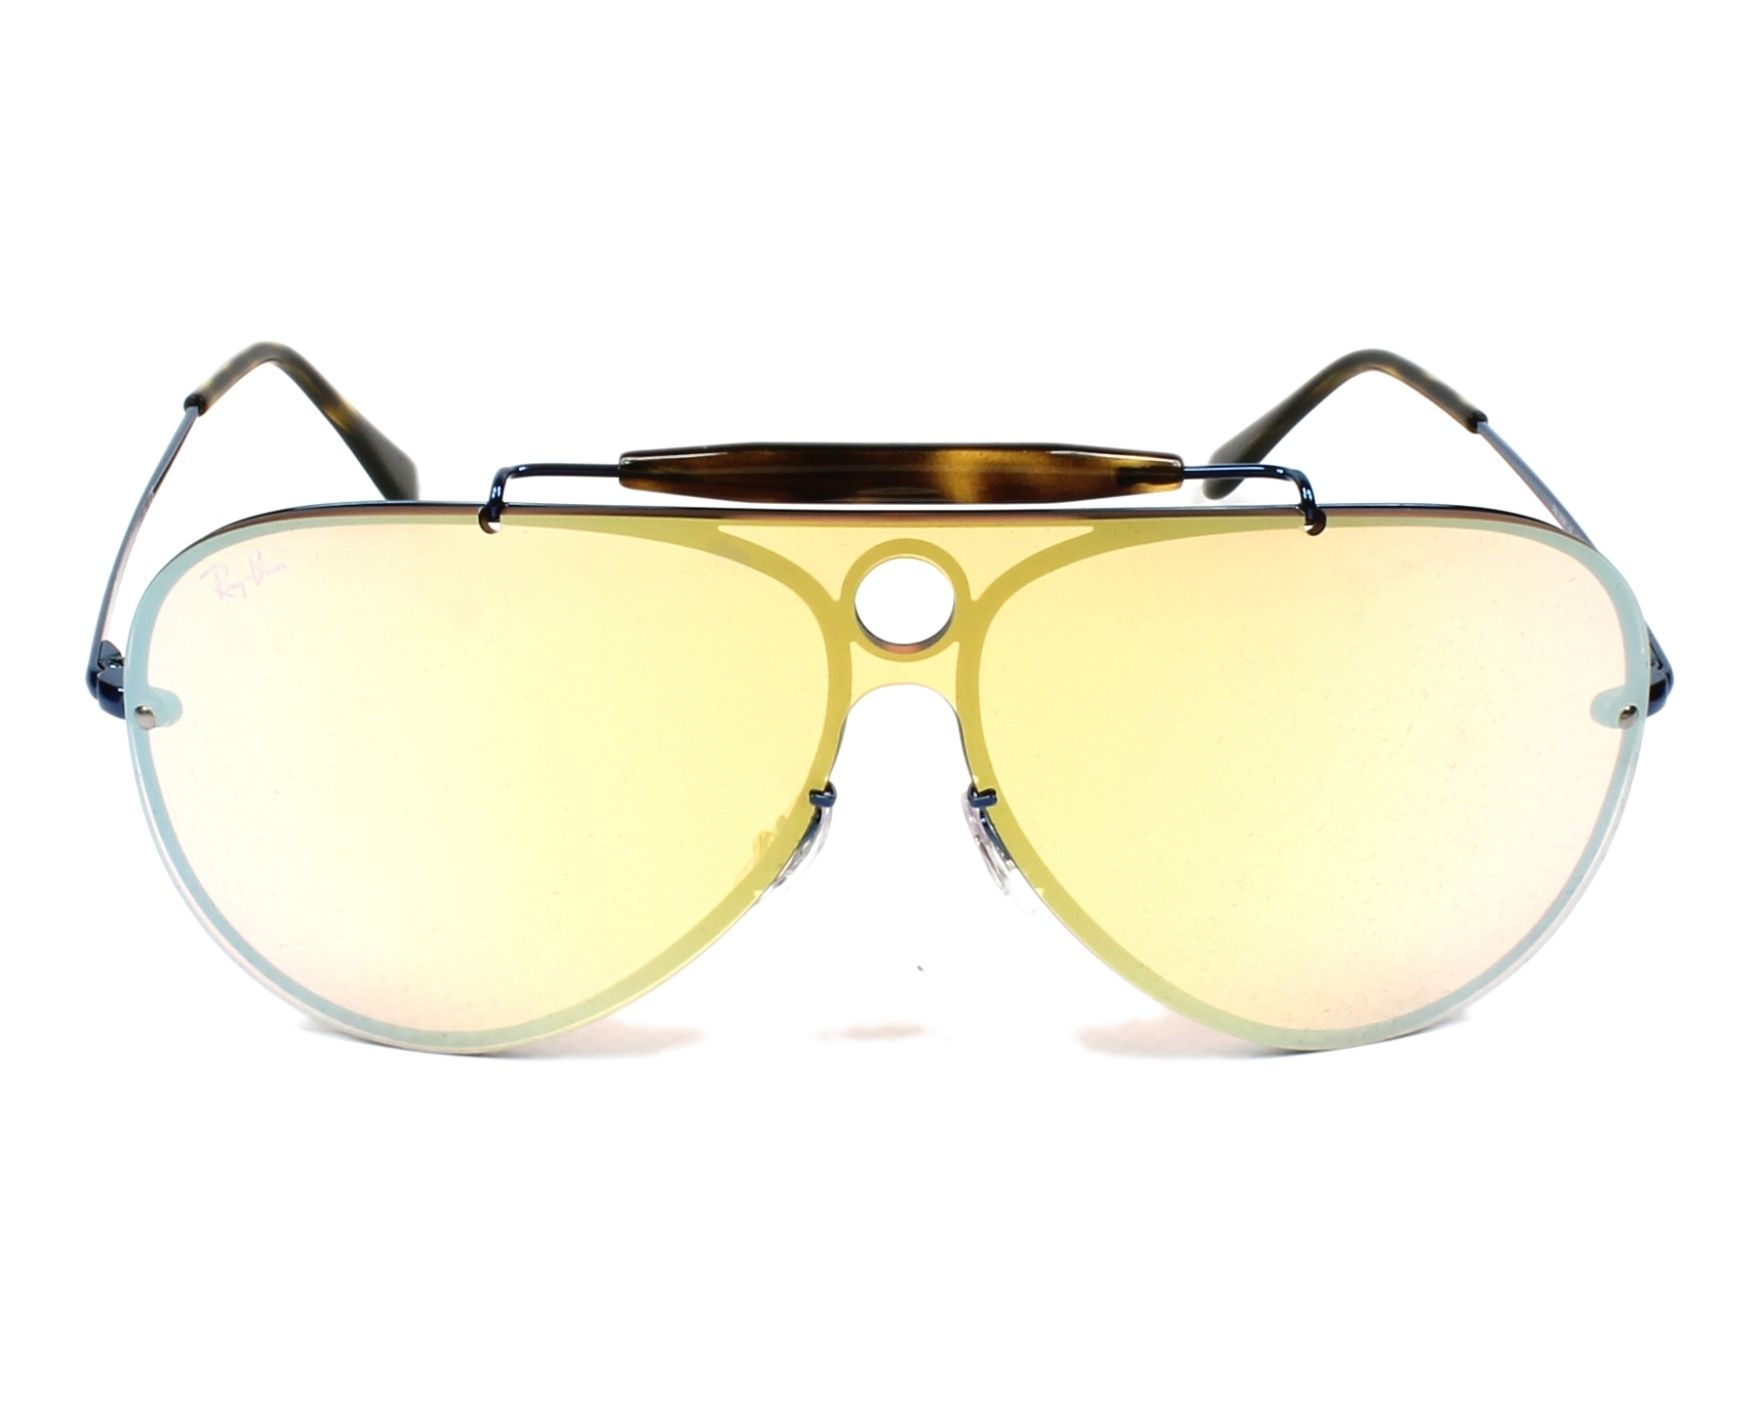 4b2875eb989 thumbnail Sunglasses Ray-Ban RB-3581-N 90387J - Blue Havana front view